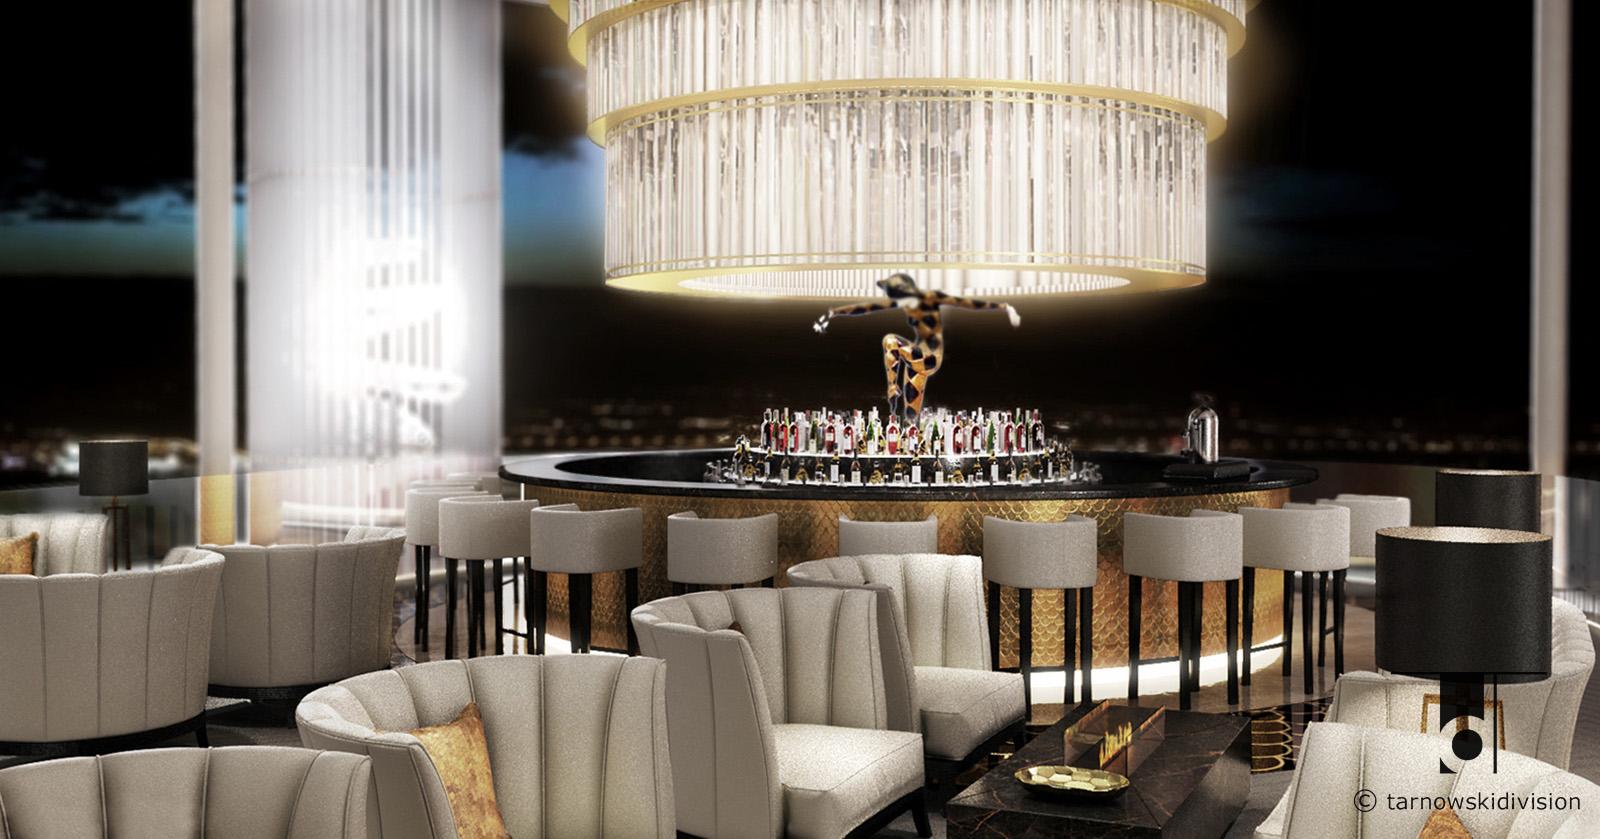 pub bar restauracja Harlequin projekt baru wnętrza bar restaurant interior design_tarnowskidivision